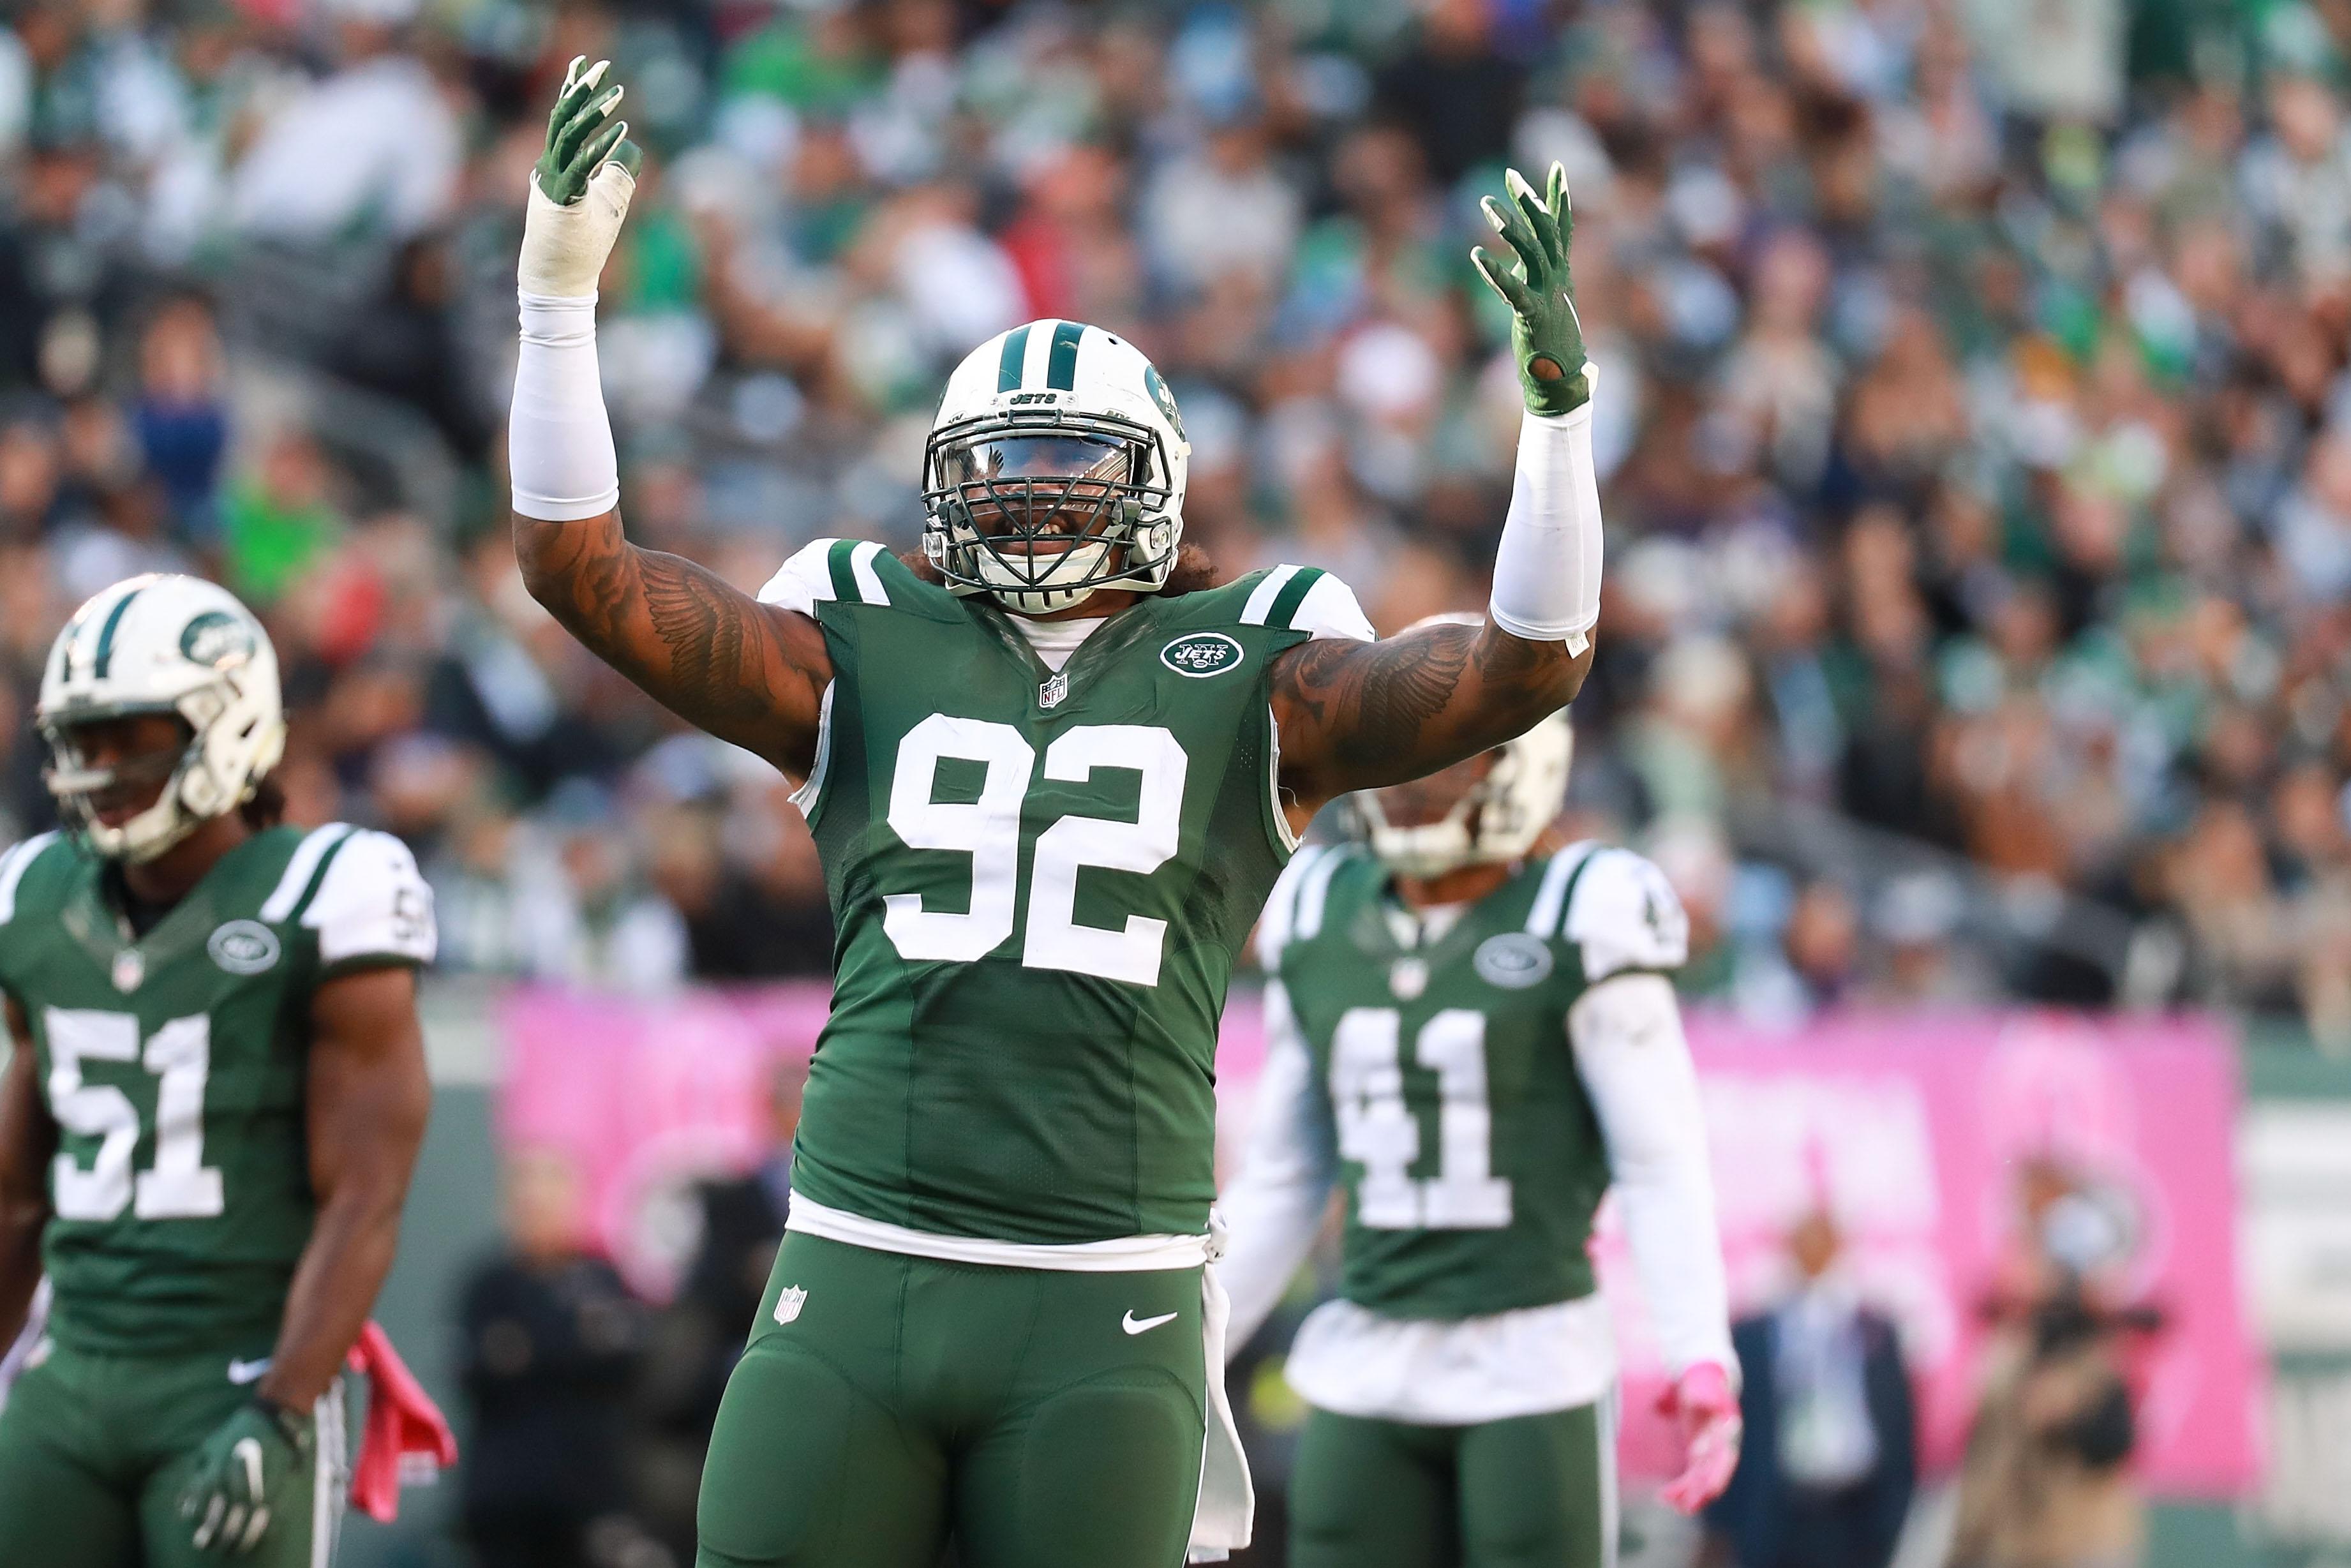 Myles Garrett to make regular season debut when Browns take on Jets